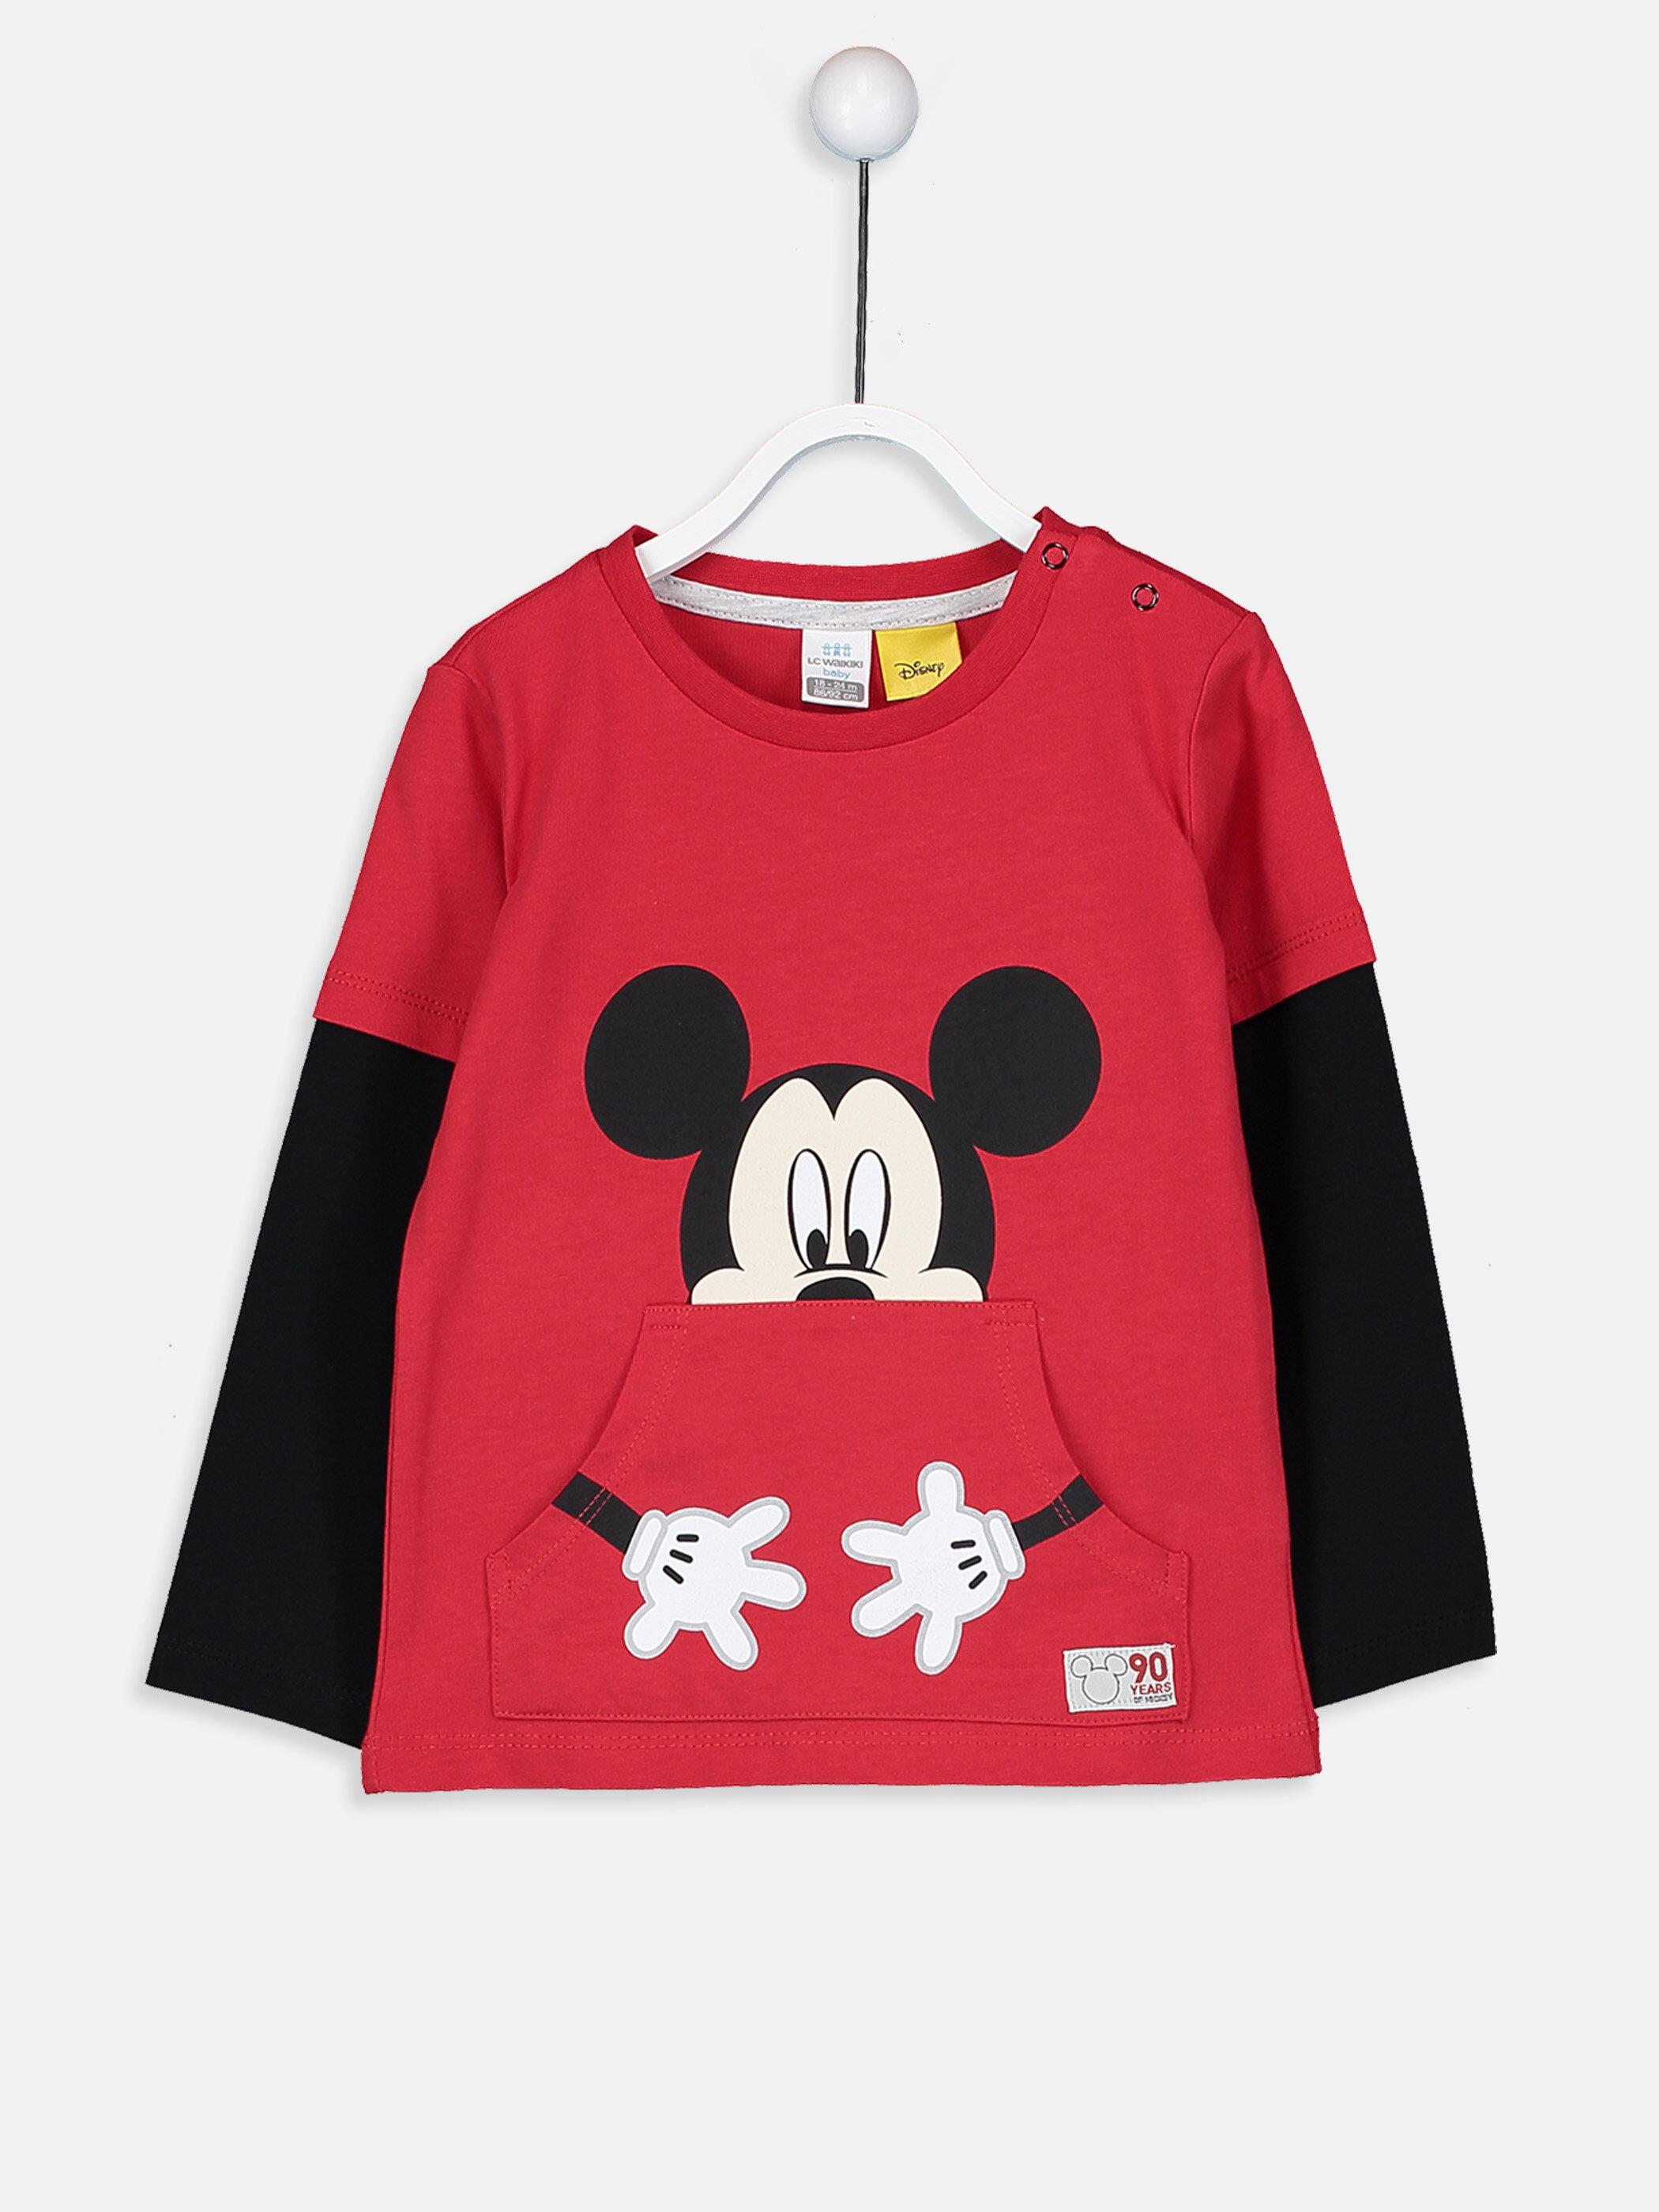 Erkek Bebek Pamuklu Mickey Mouse Baskılı Tişört -9S6461Z1-HNK